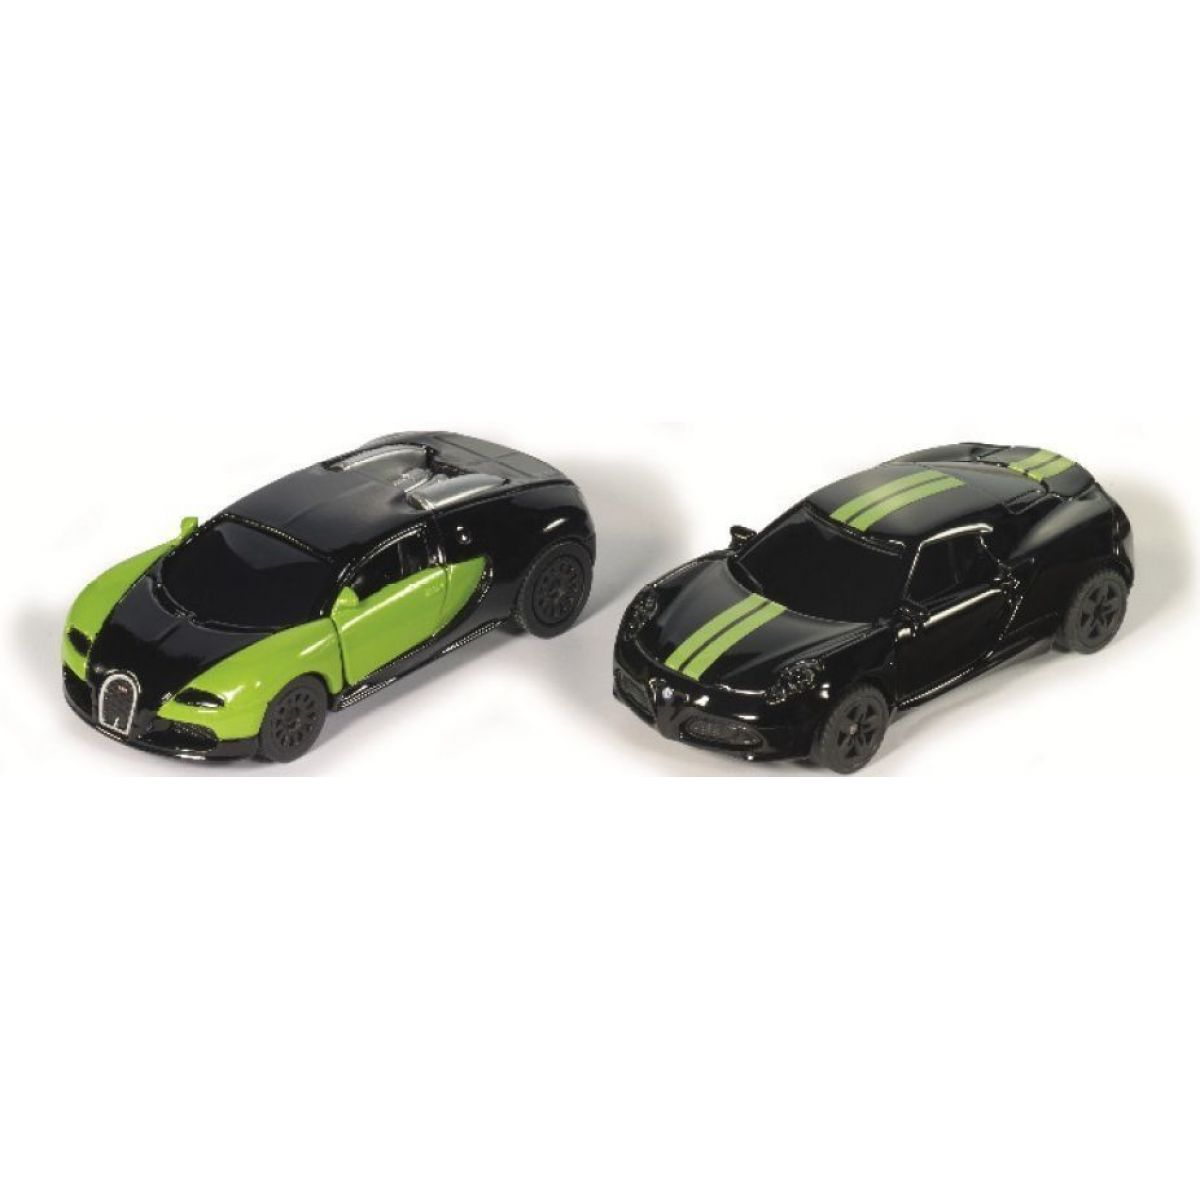 Siku blister 6309 čierno & zelená Special Edition